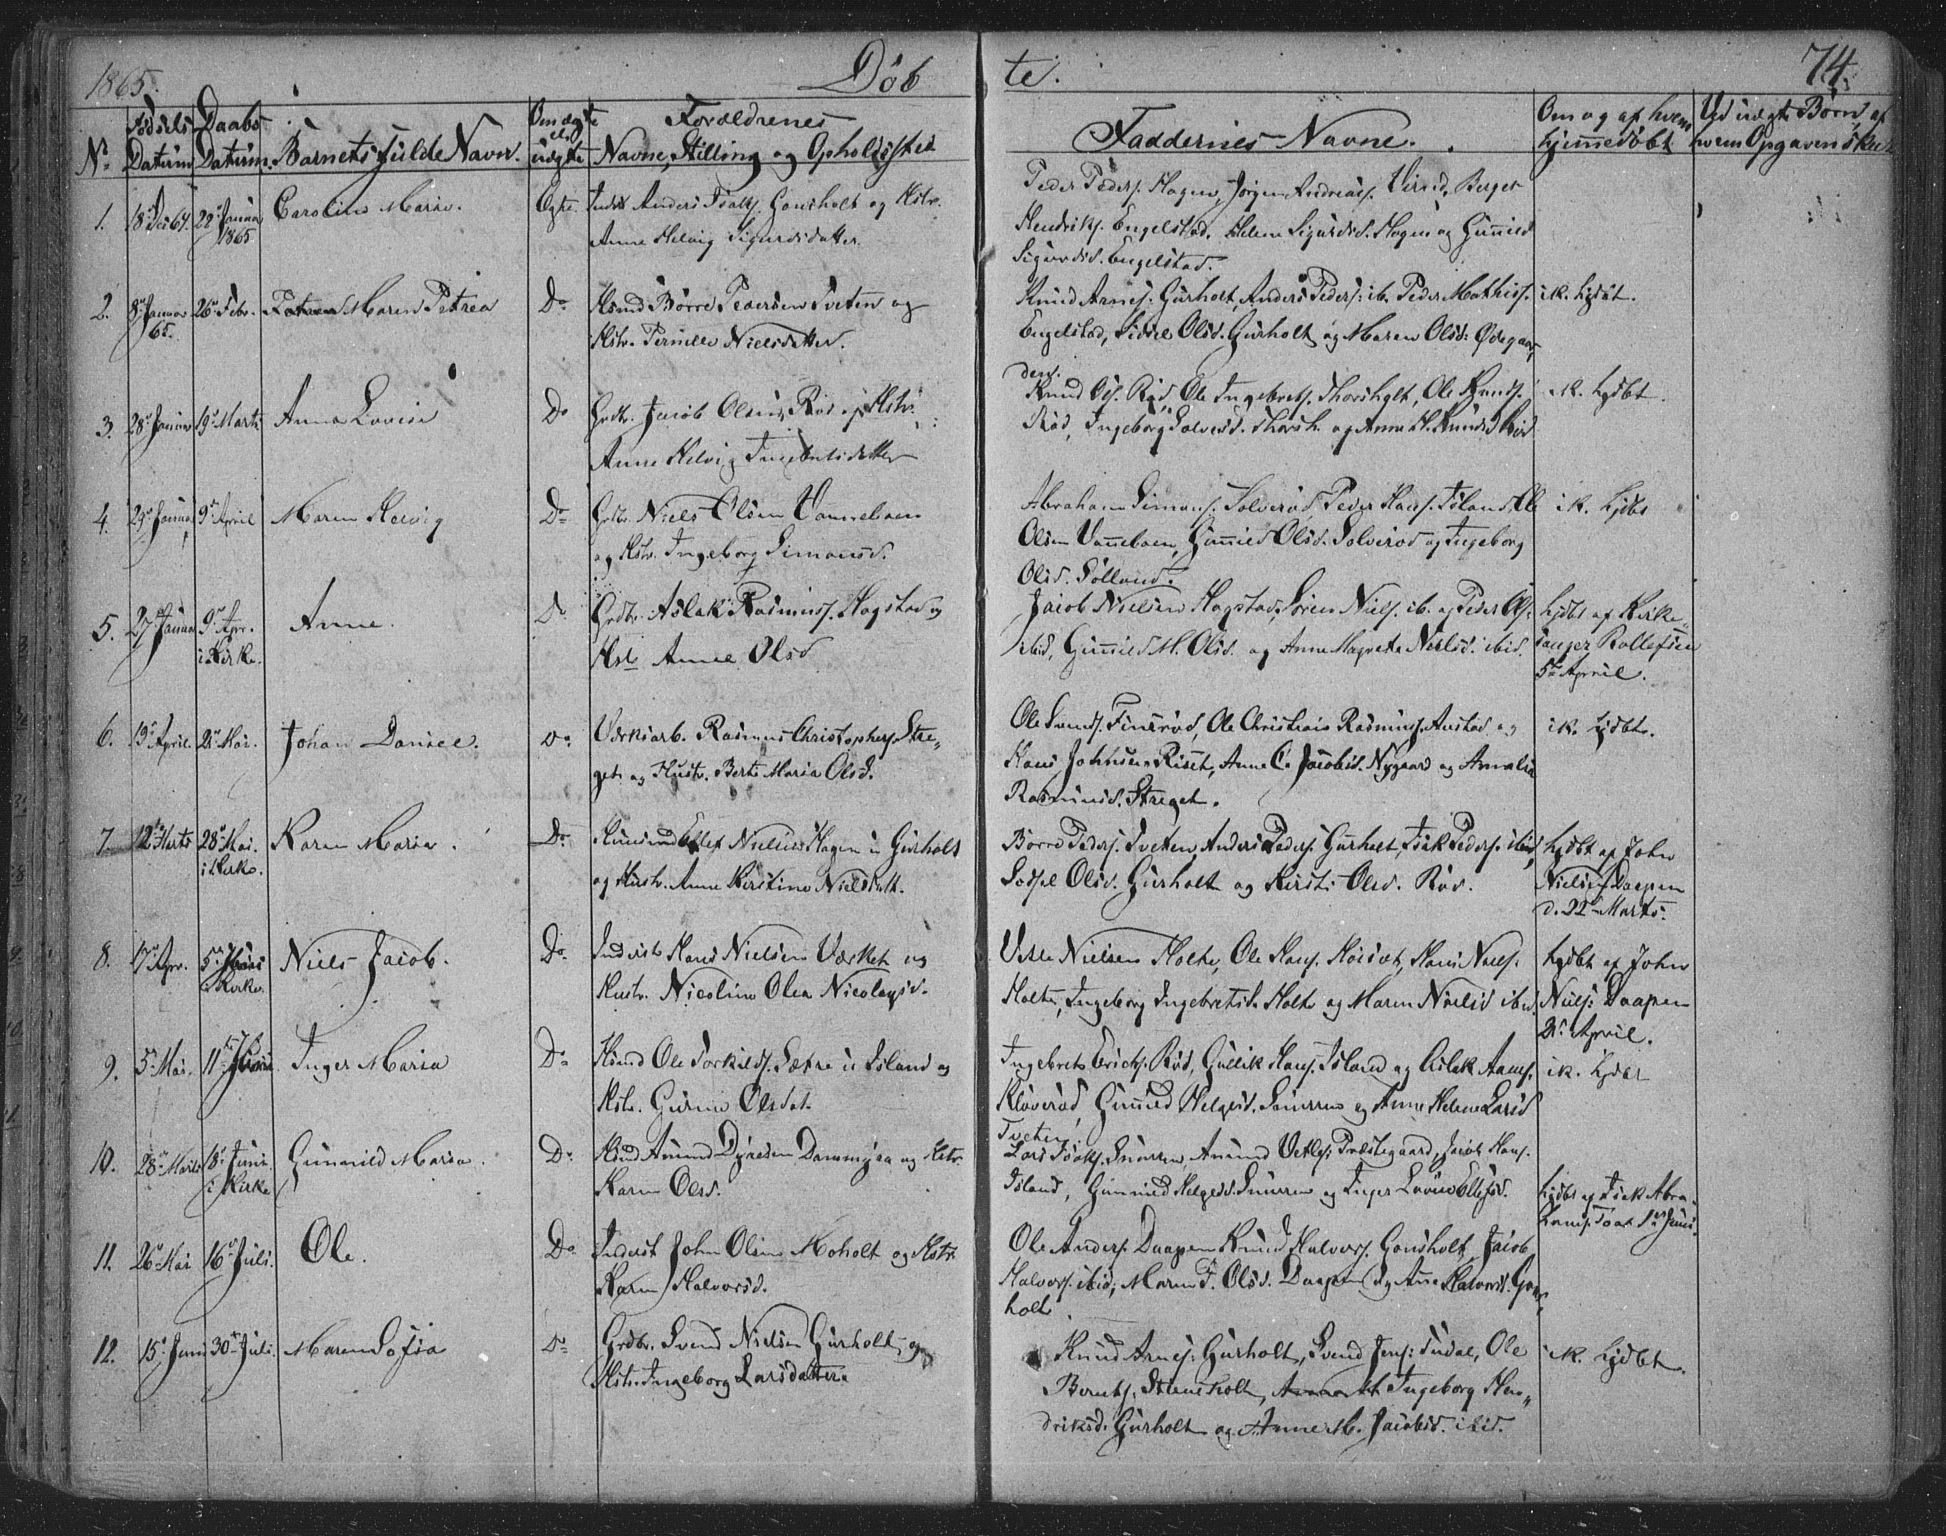 SAKO, Siljan kirkebøker, F/Fa/L0001: Parish register (official) no. 1, 1831-1870, p. 74